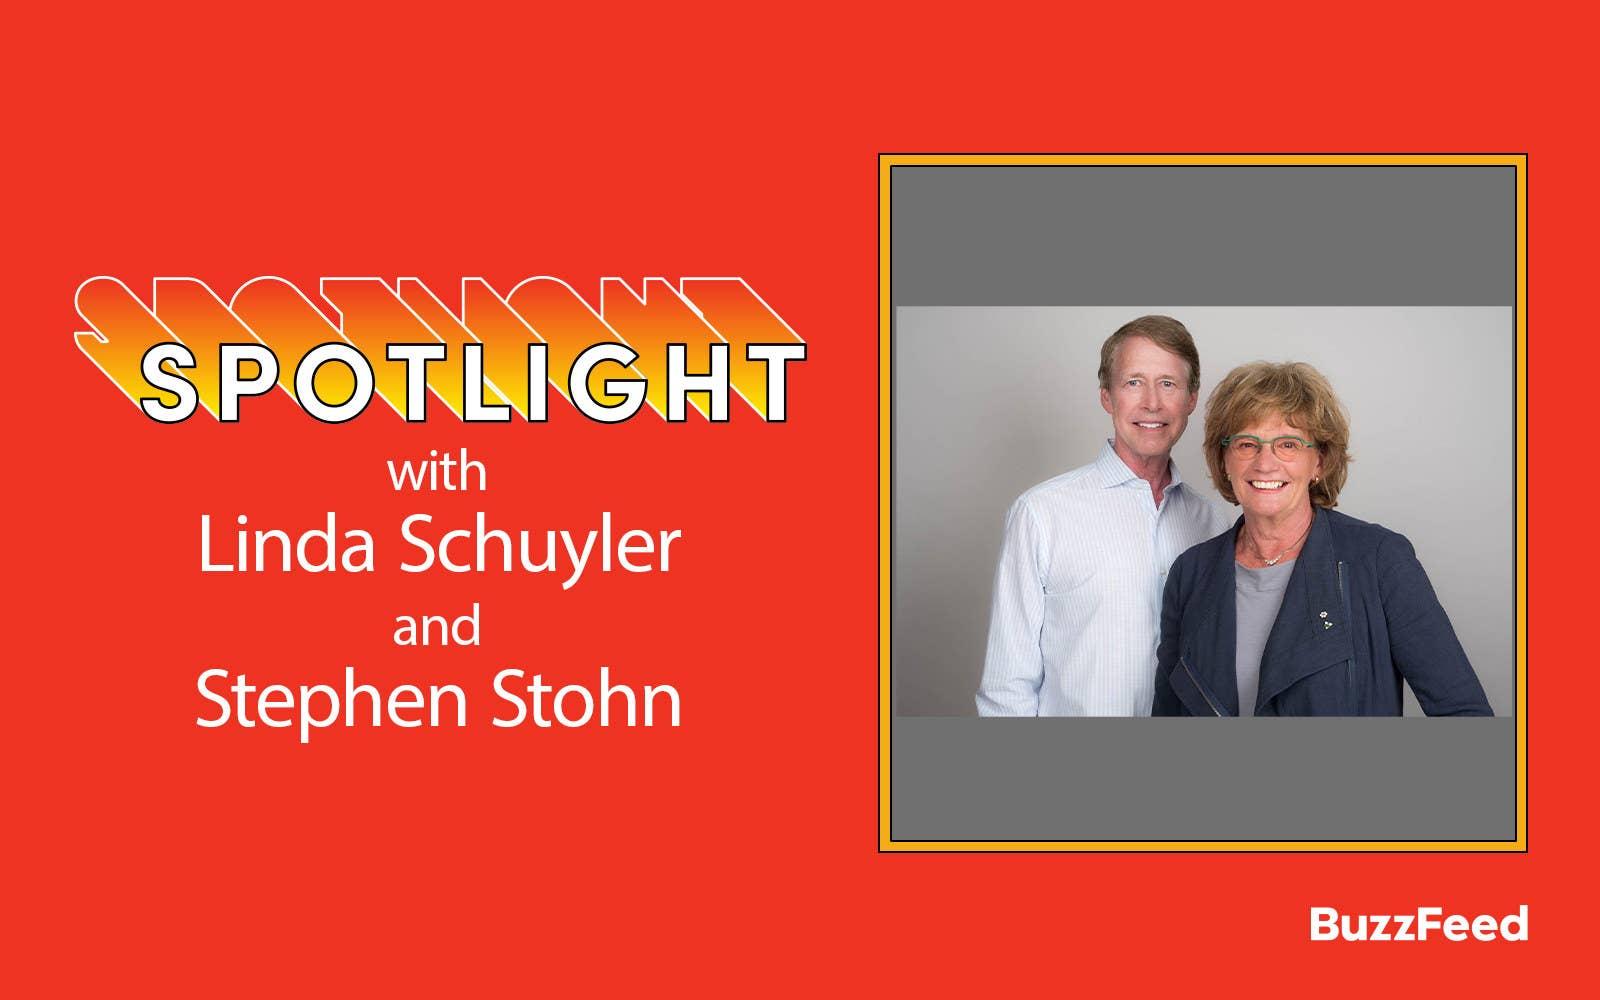 Spotlight with Linda Schuyler and Stephen Stohn